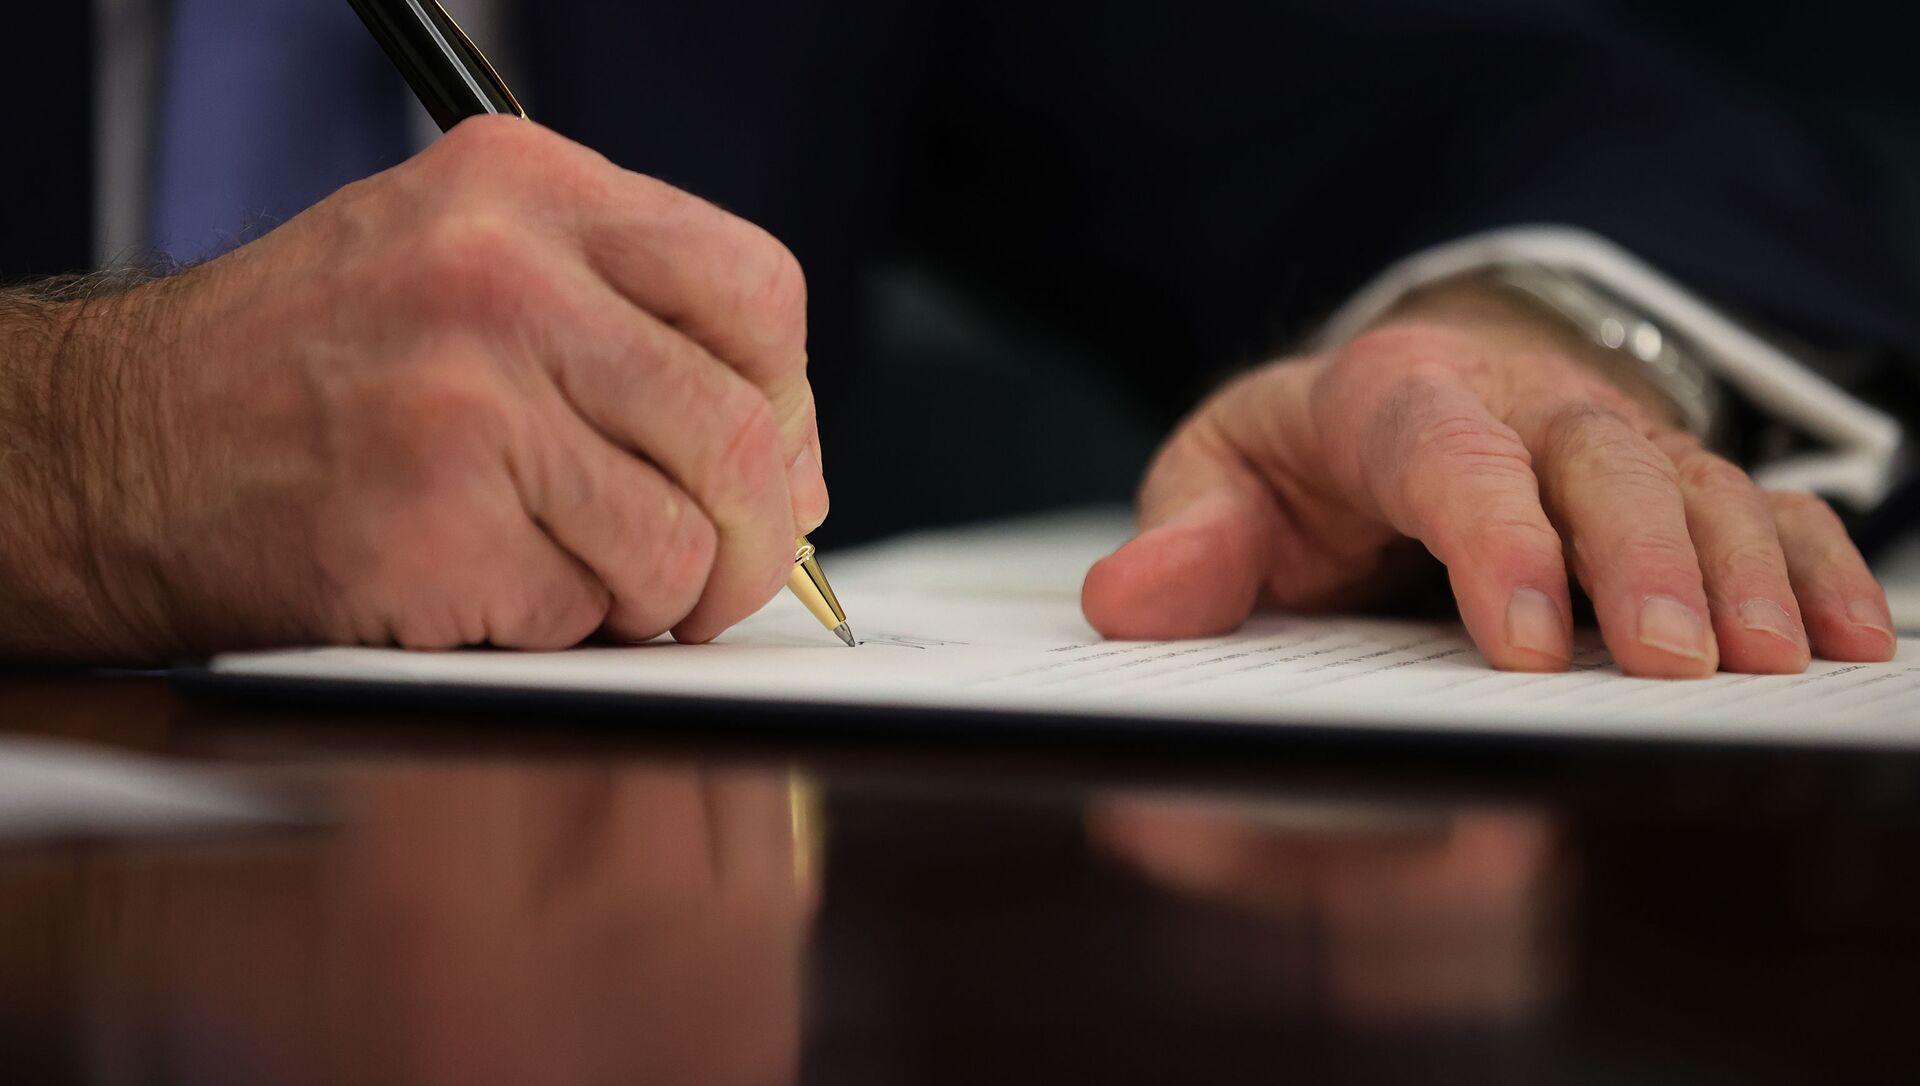 Joe Biden, el presidente de EEUU, firmando una órden ejecutiva - Sputnik Mundo, 1920, 03.02.2021